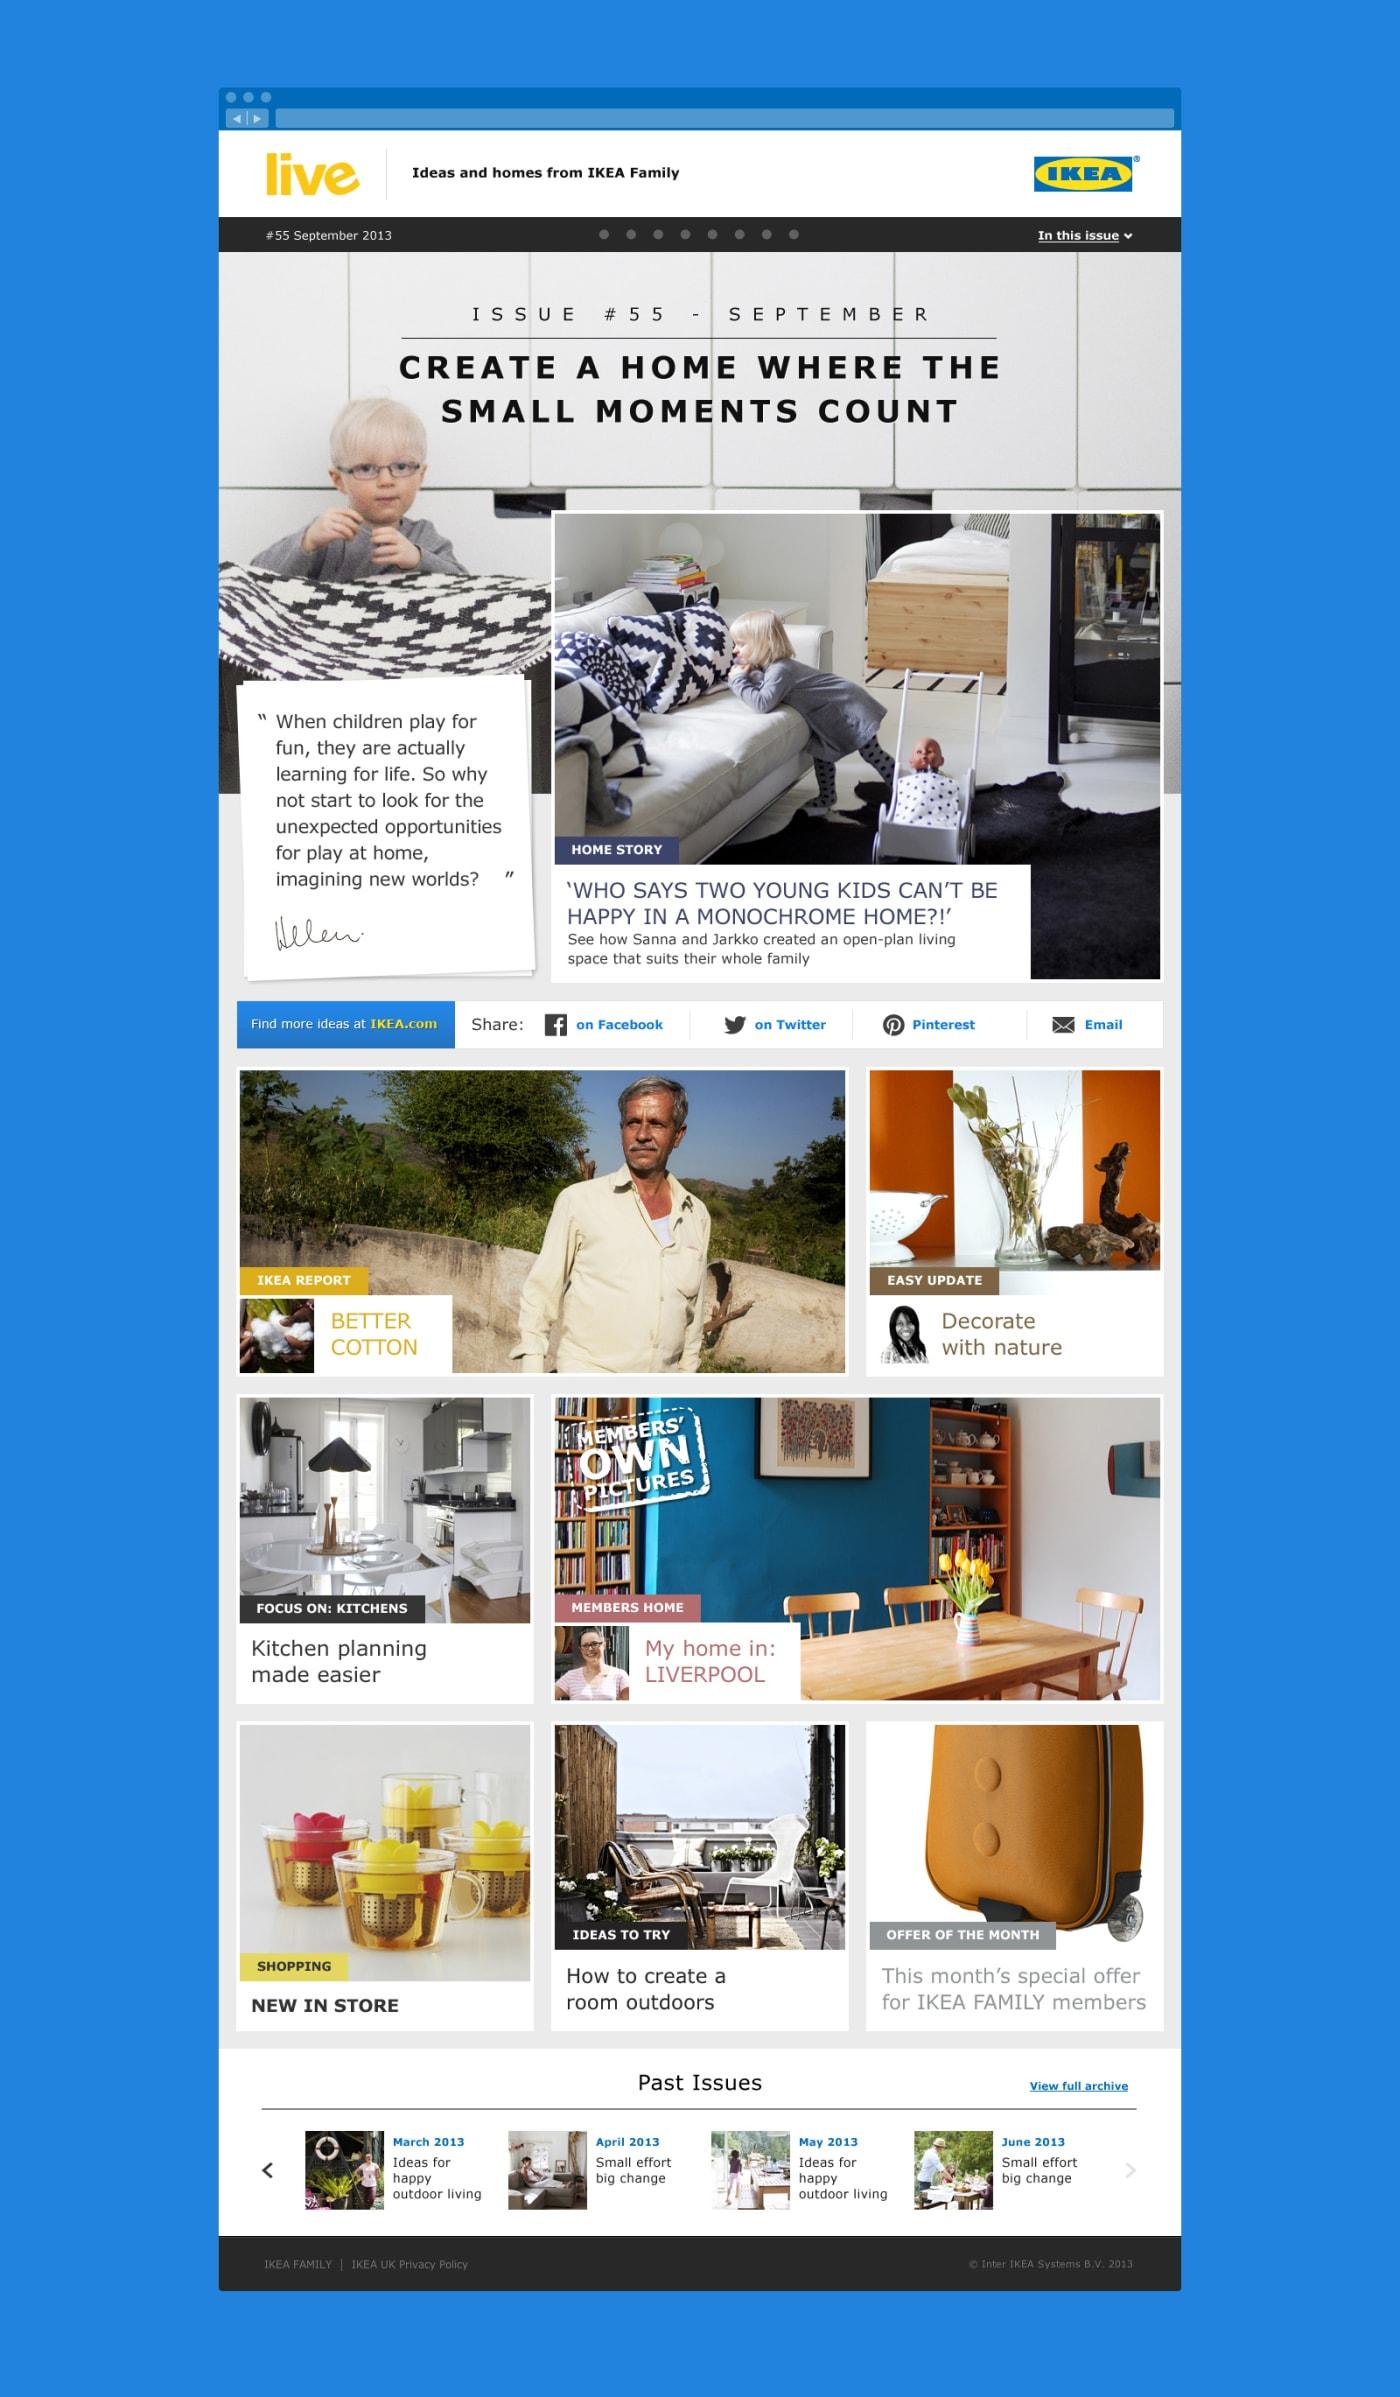 A screenshot of the IKEA Family Live home screen.